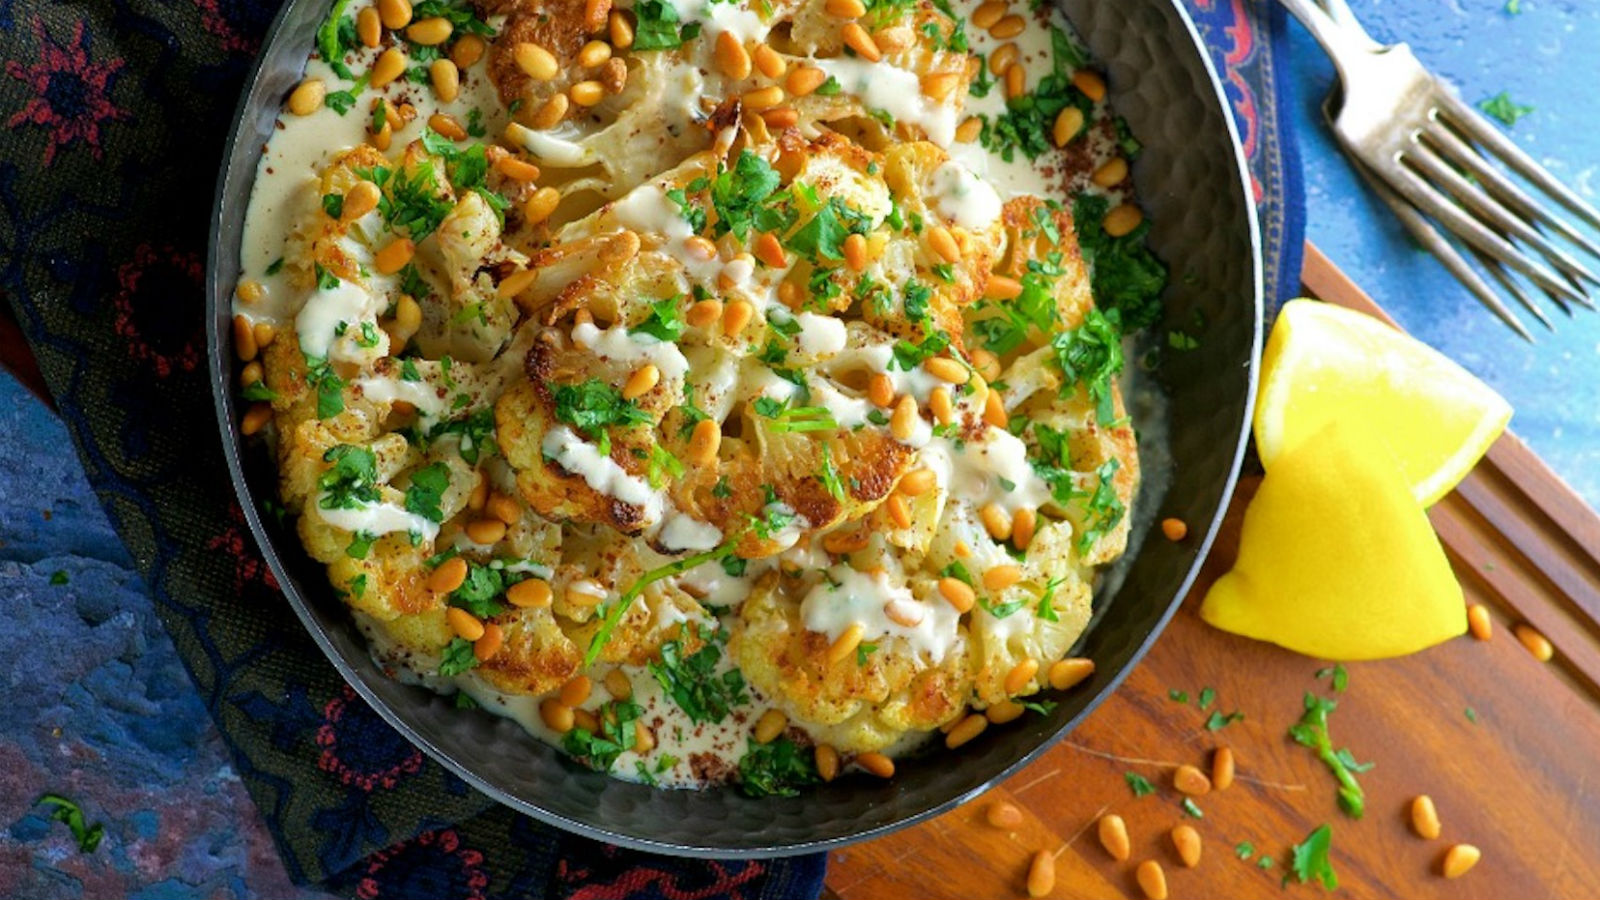 Cauliflower Steak with Tahini and Pine Nuts Recipe